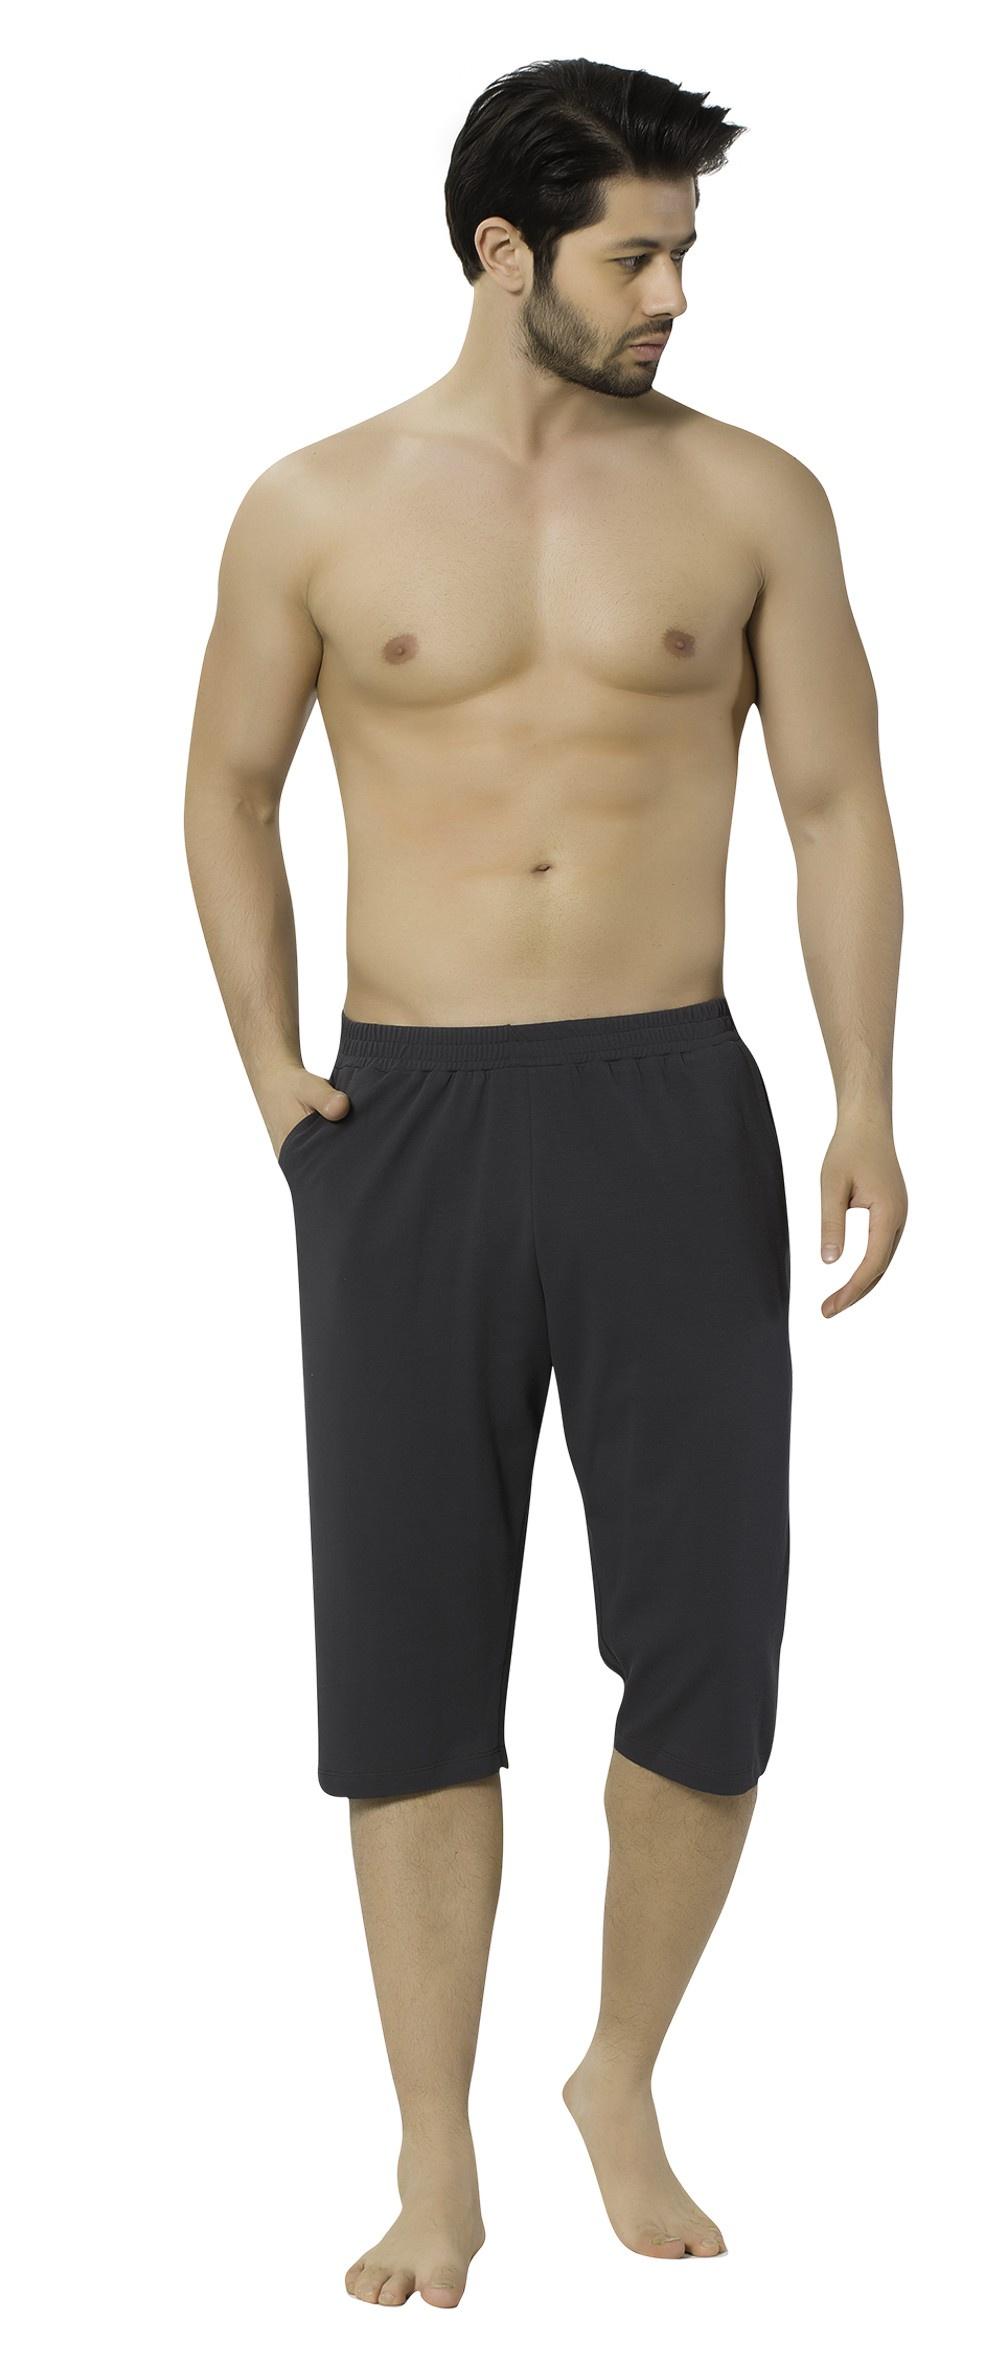 купить Шорты Ozkan Underwear по цене 1610 рублей